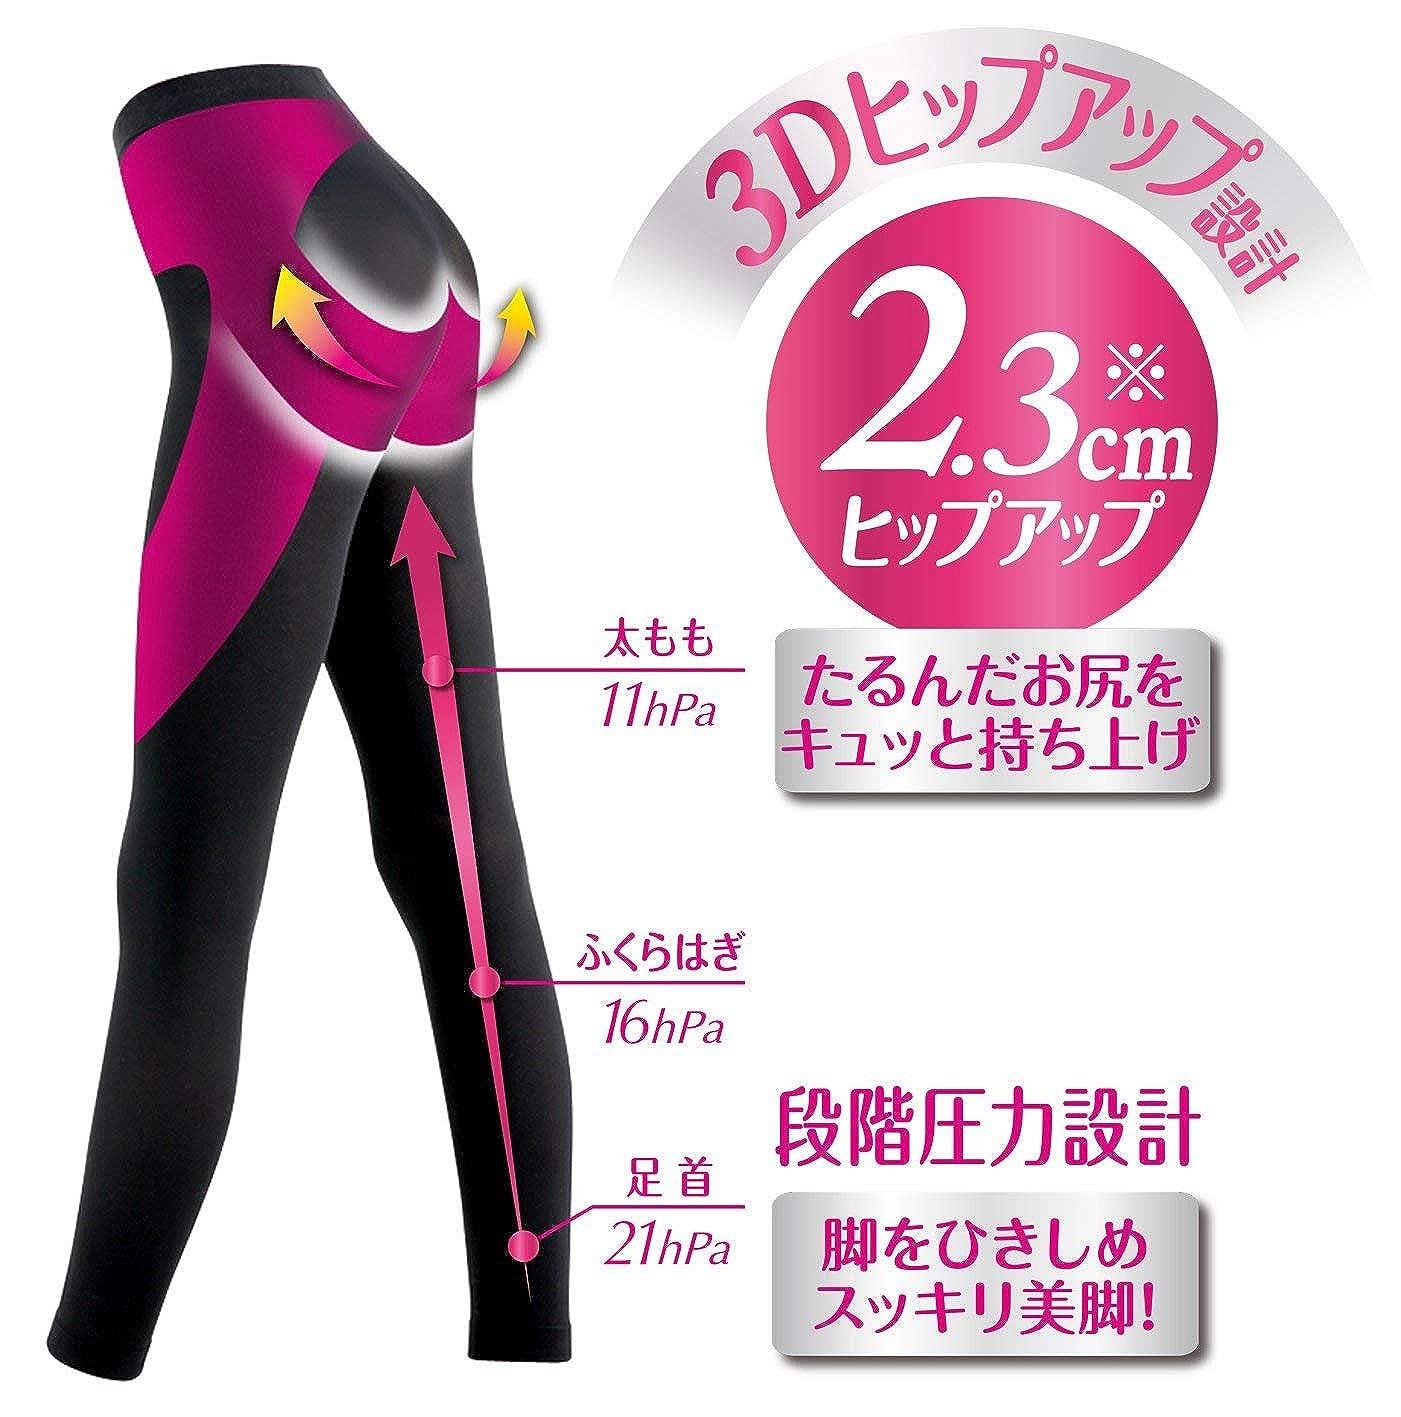 Japanese socks and tights Slim Walk Beau Acty socks Legs /& Nice Bottom leggings,Black M ~ L size